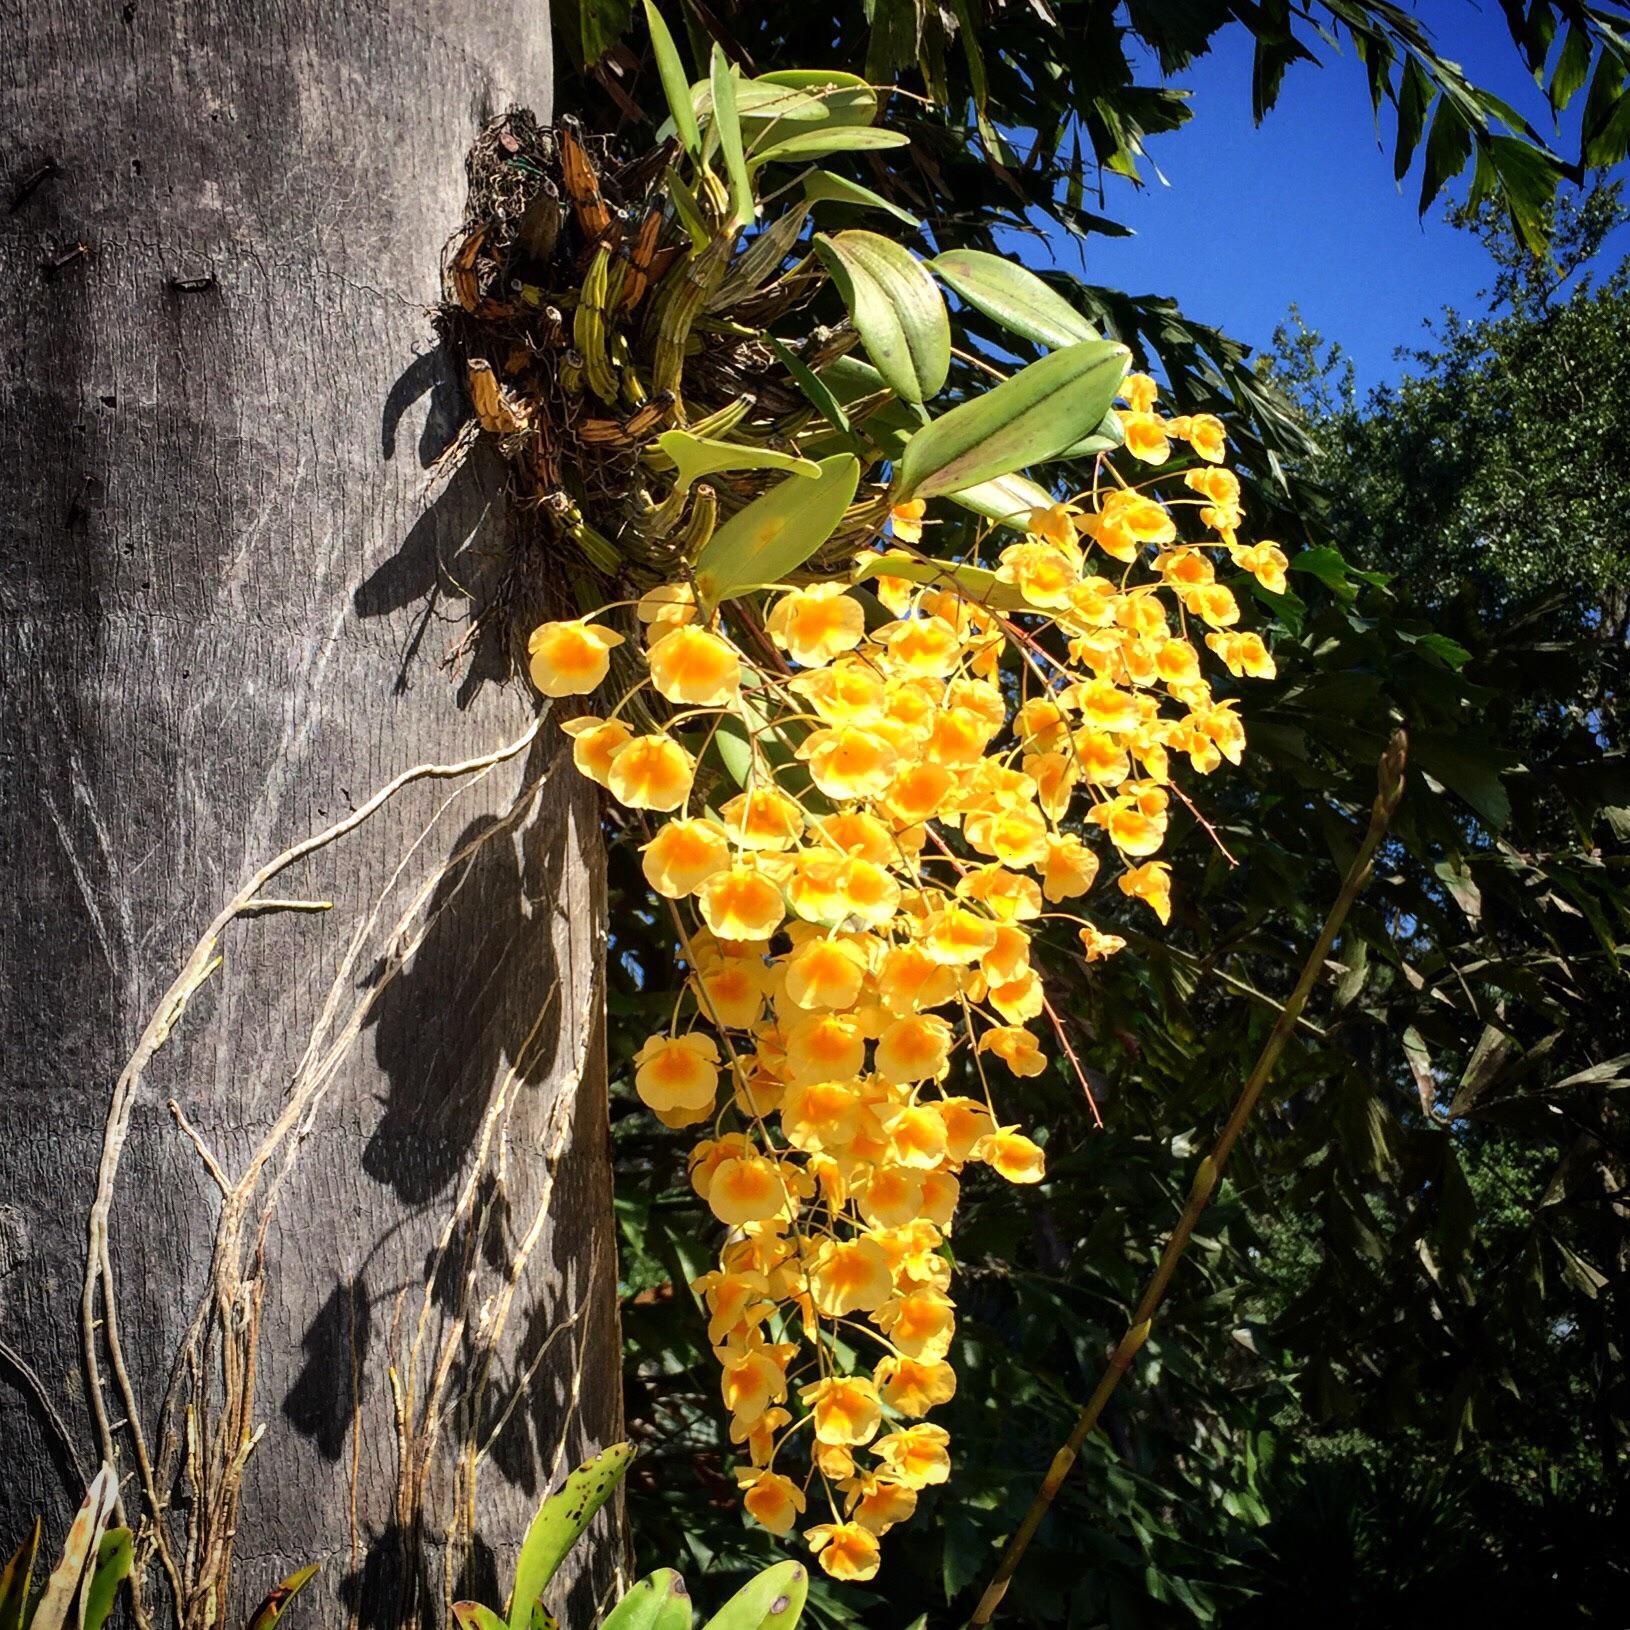 dendrobium aggregatum lindleyi orchid species.jpg